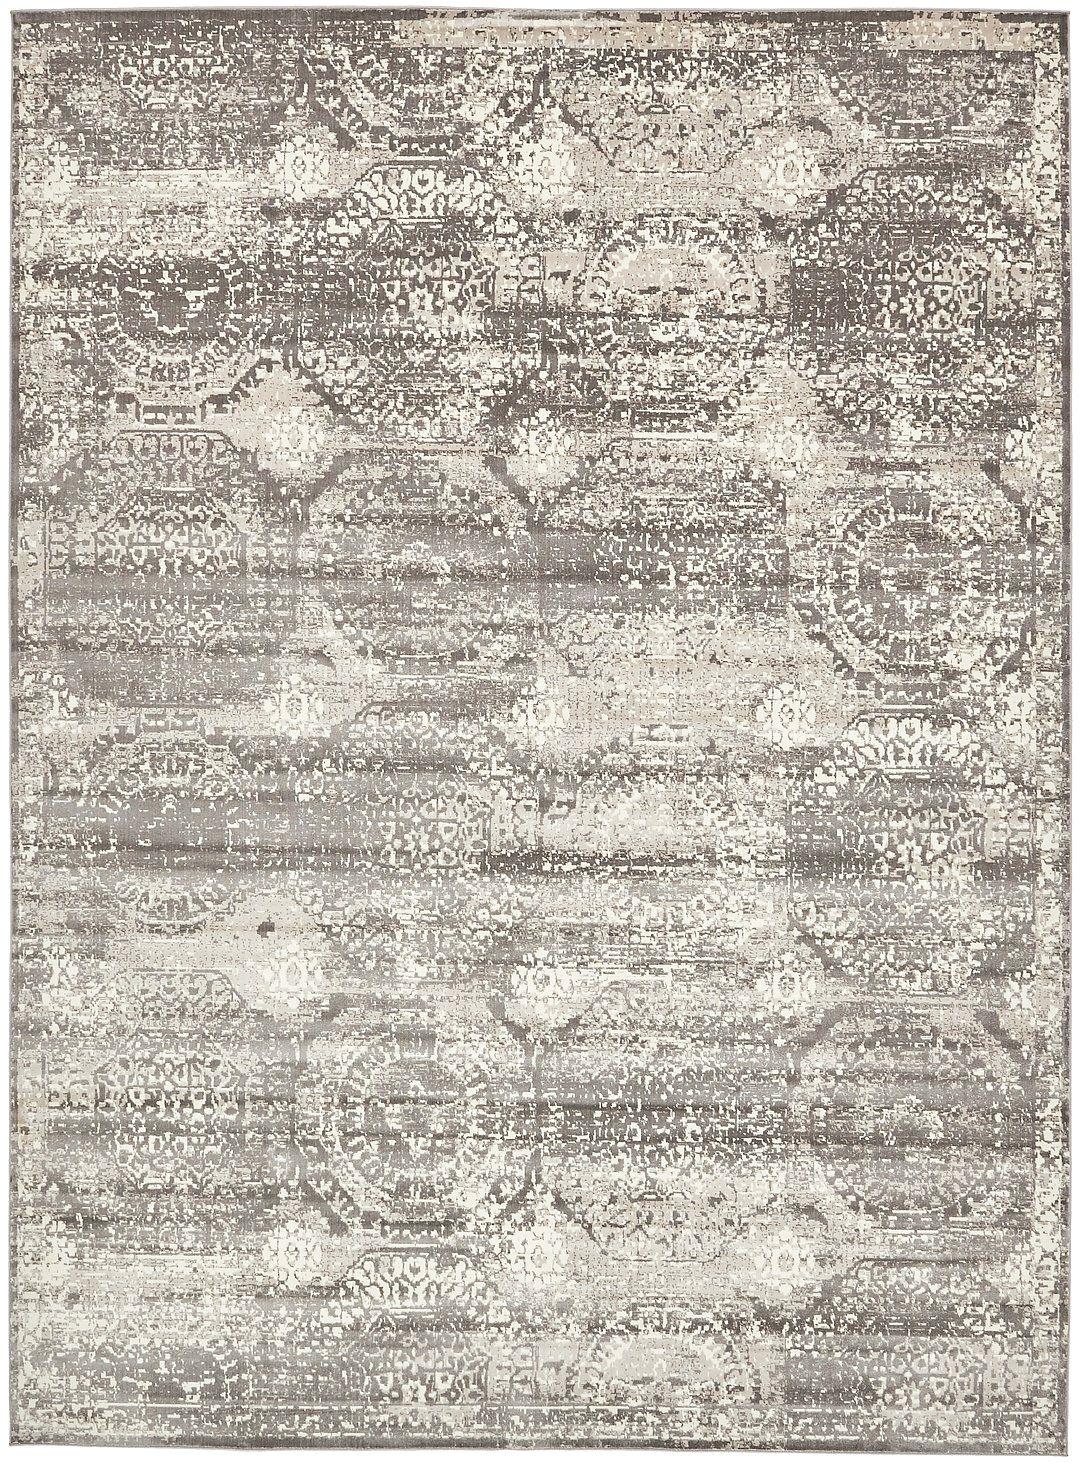 area rug vintage dark gray 10 x 13 5 ft st